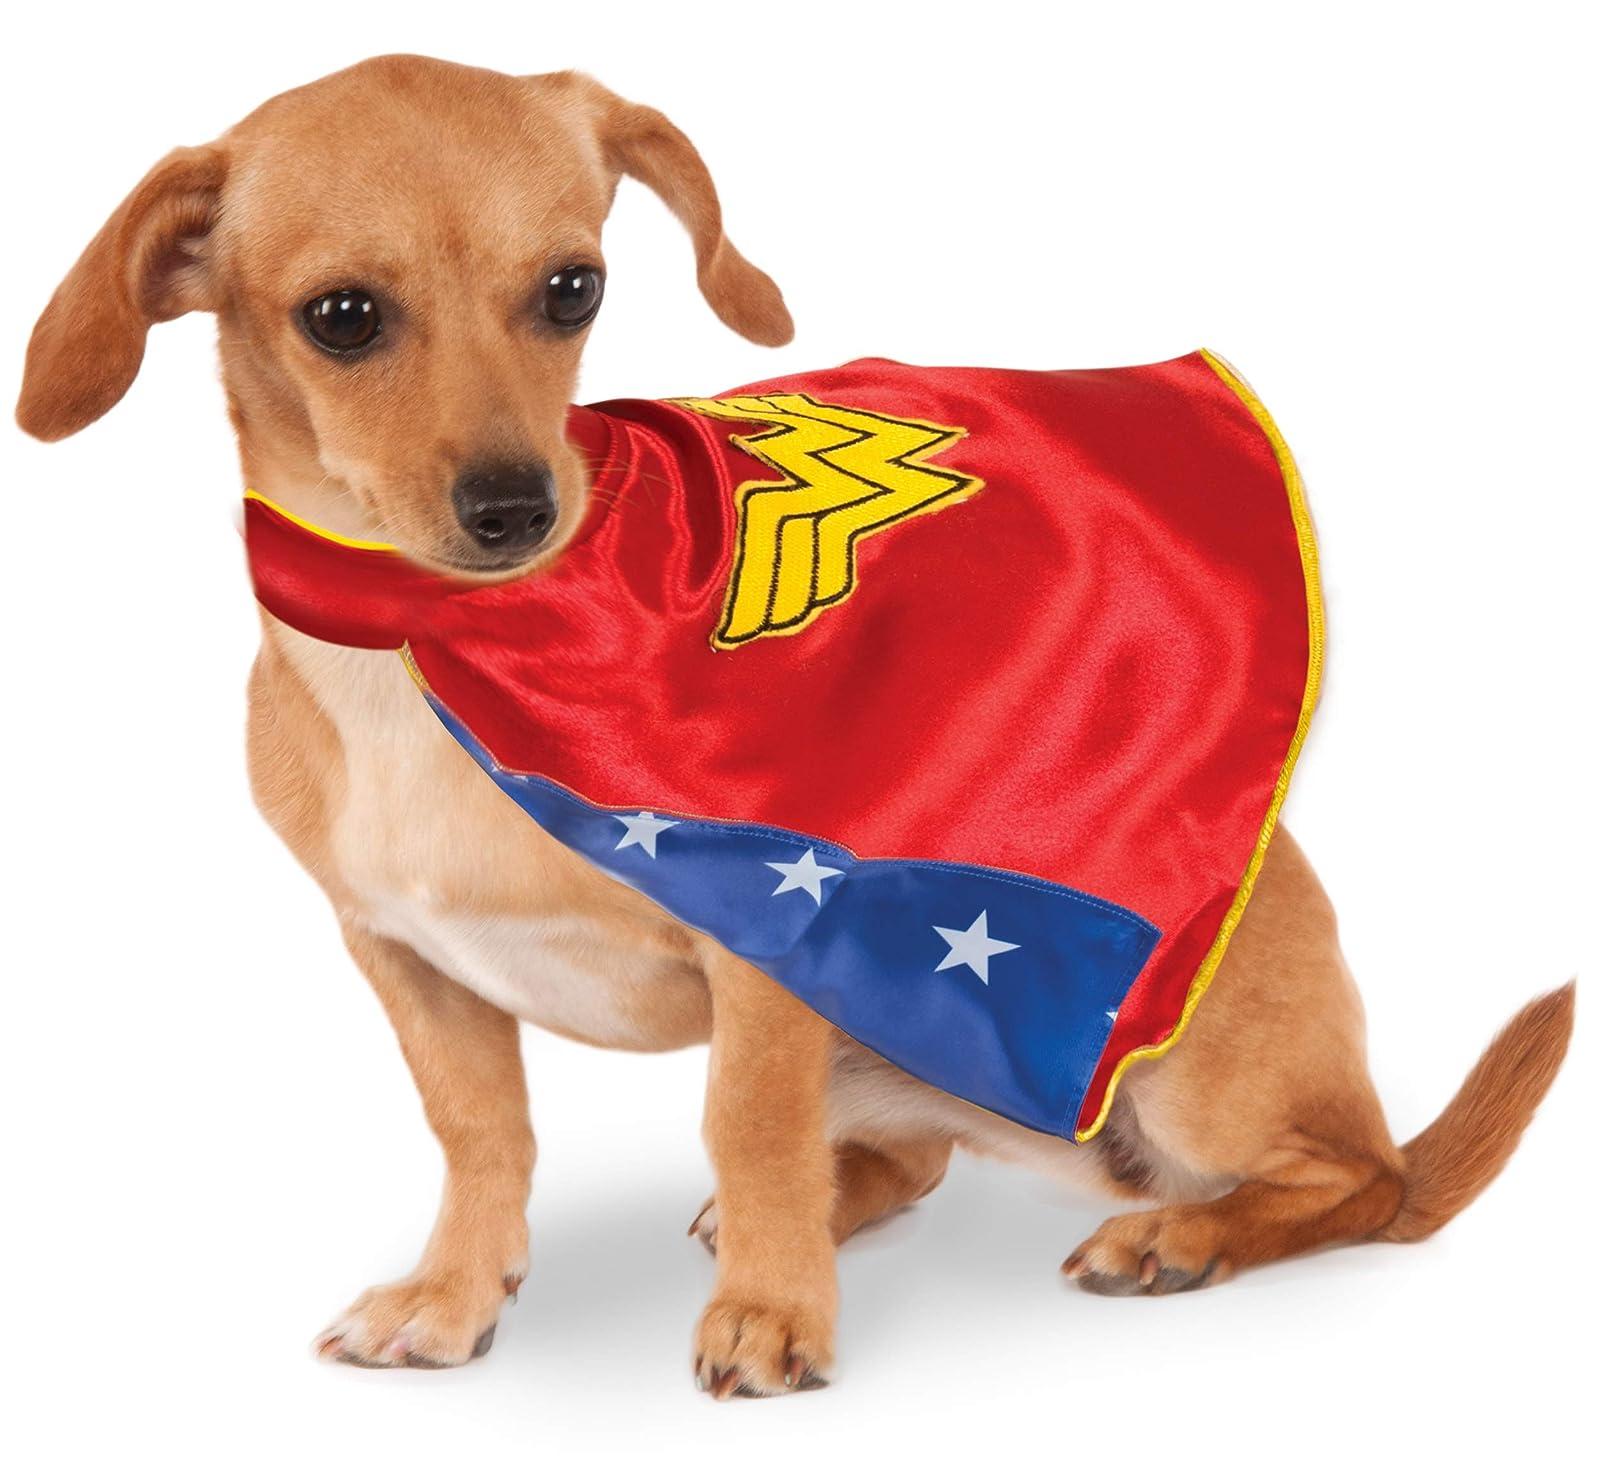 DC Comics Wonder Woman Pet Cape Medium 580321 M Multicolor - 2